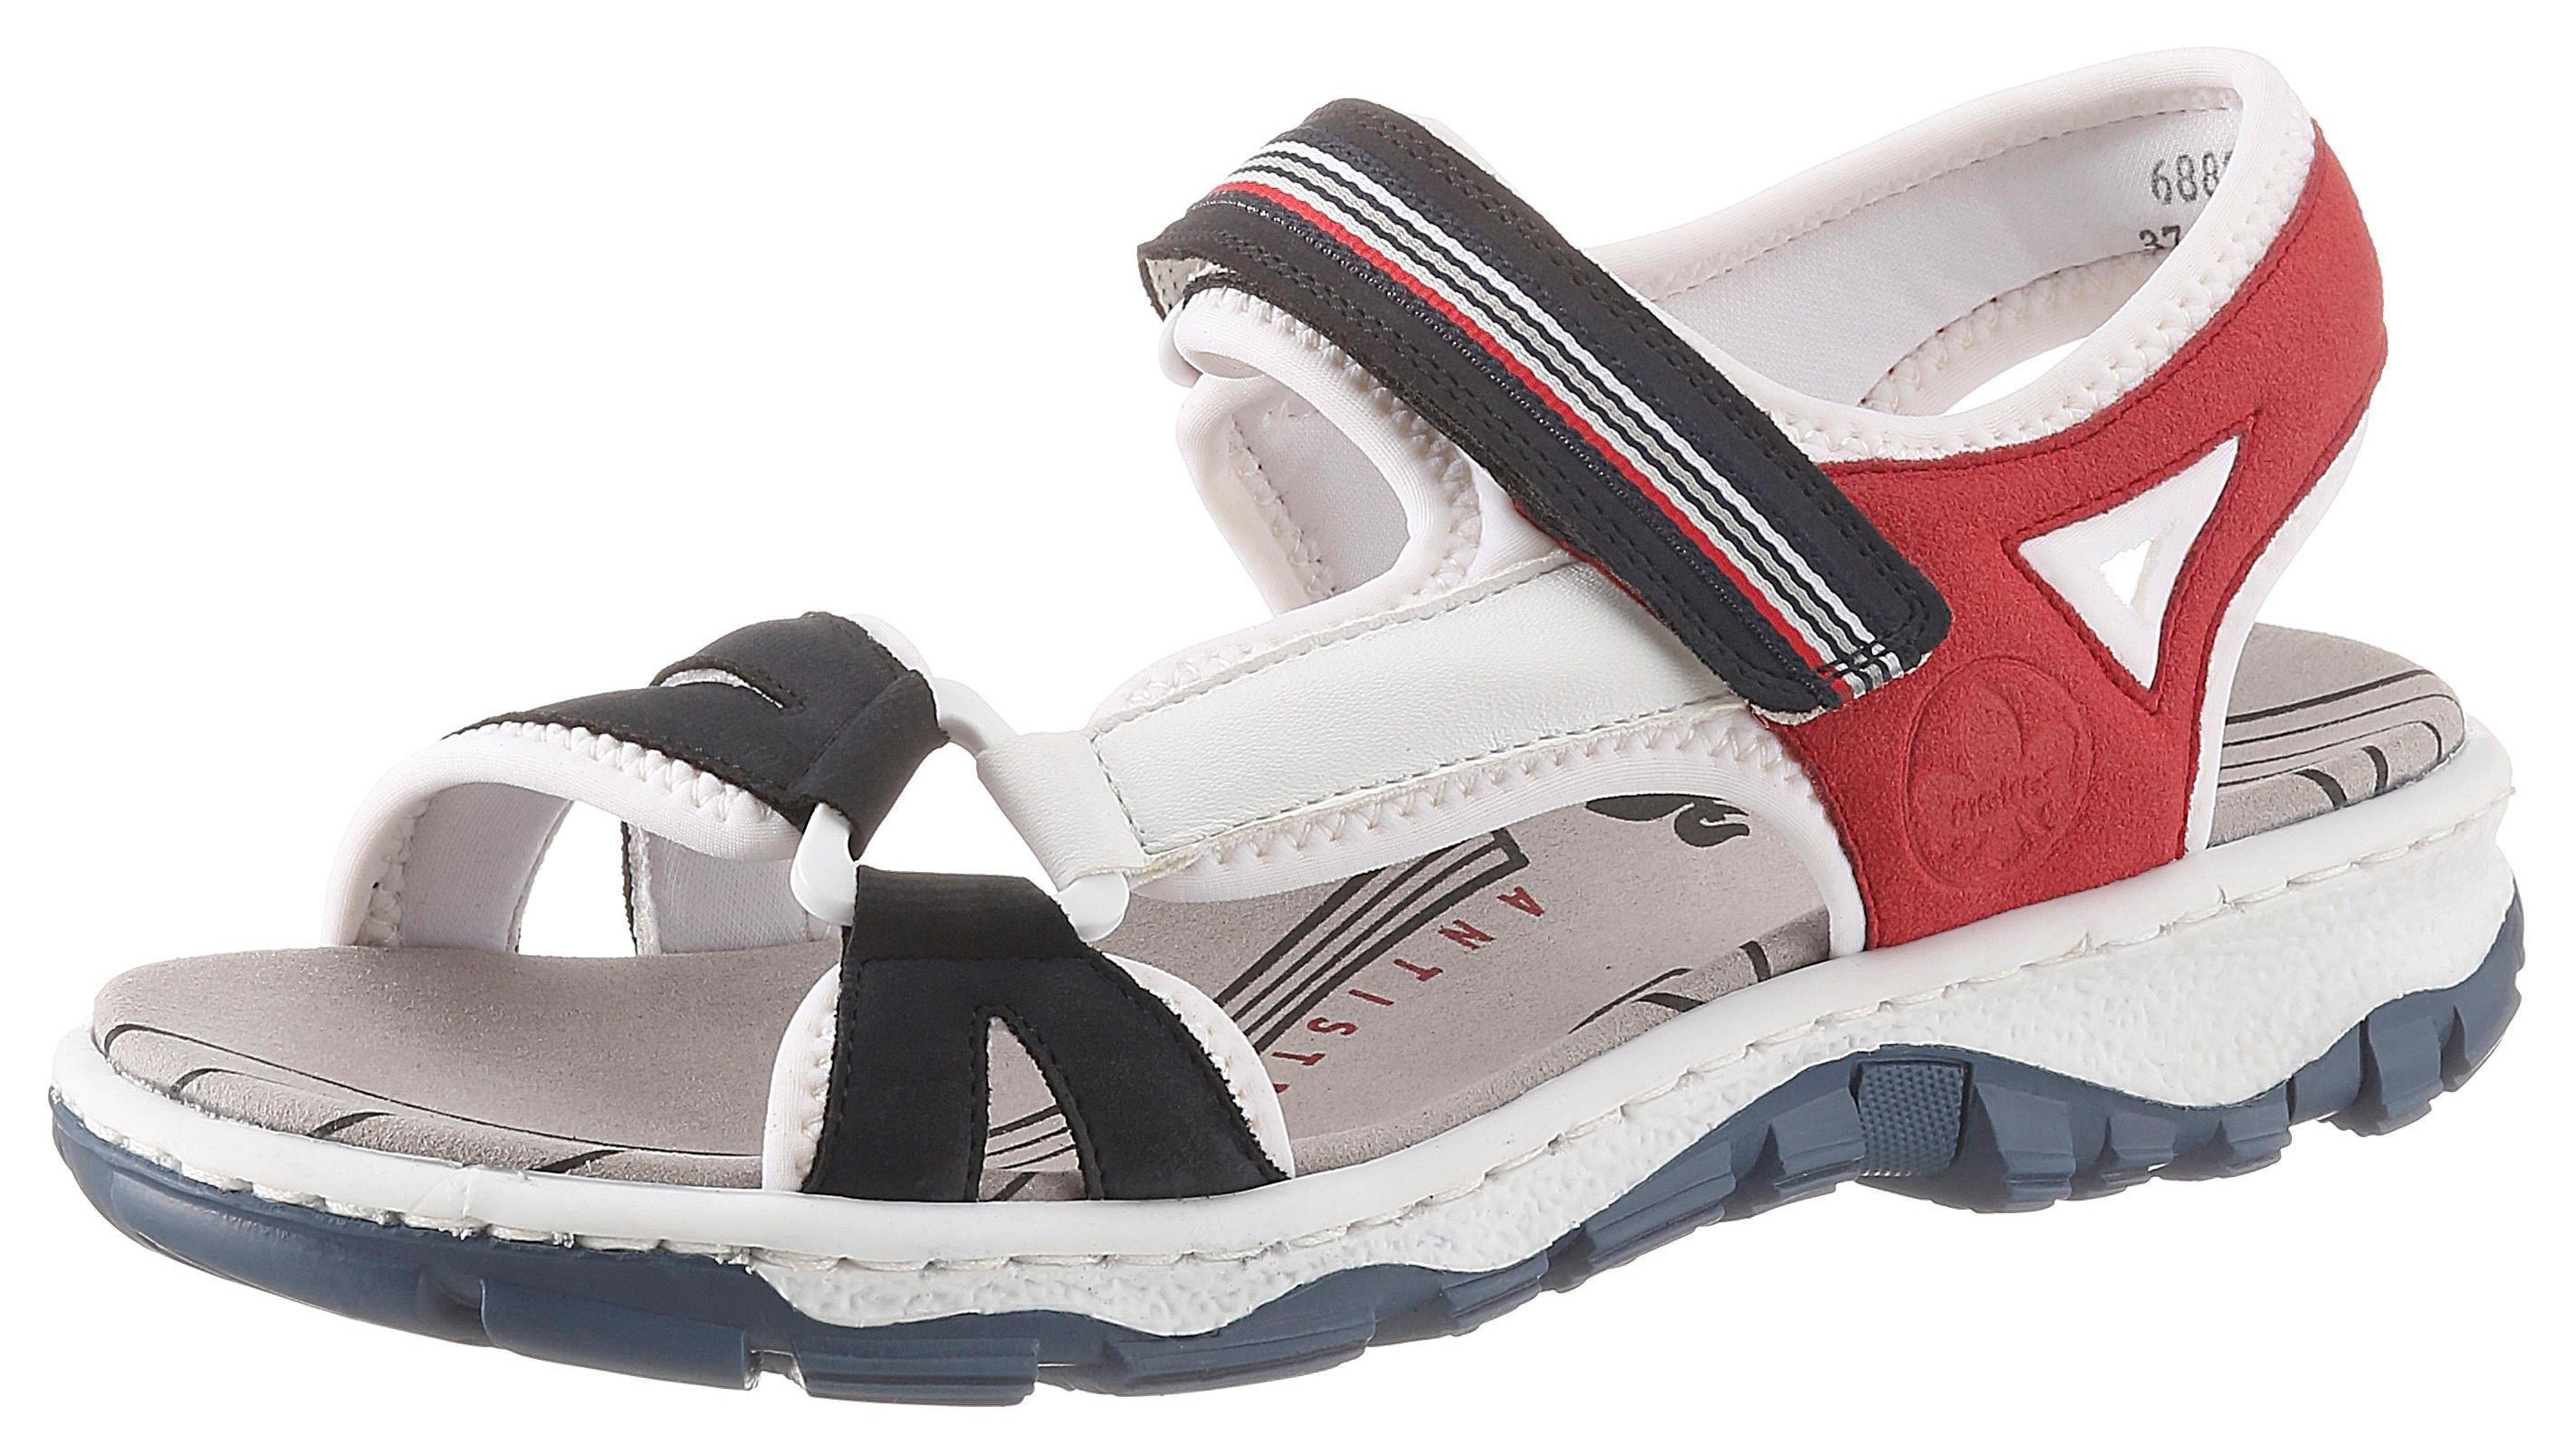 Rieker sandalen online kopen op otto.nl